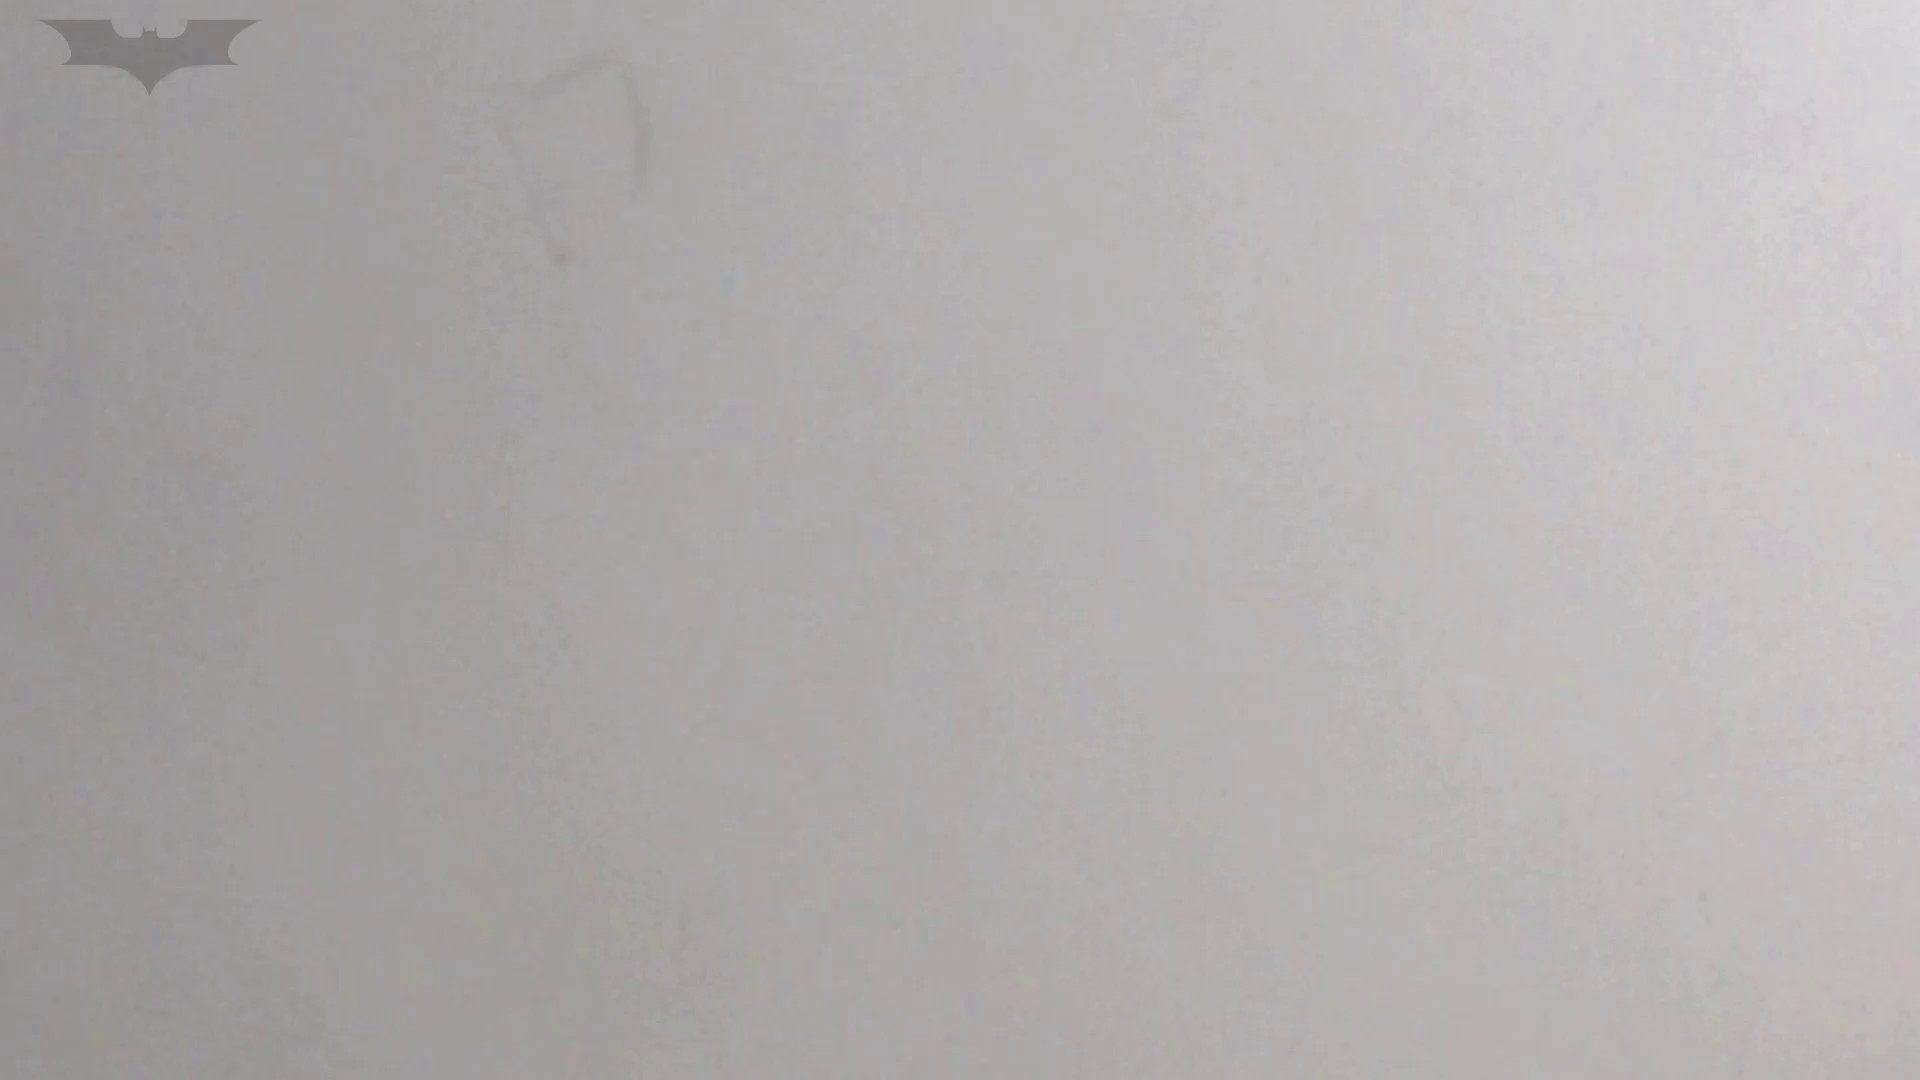 JD盗撮 美女の洗面所の秘密 Vol.10 特撮トイレ | 0  101画像 42